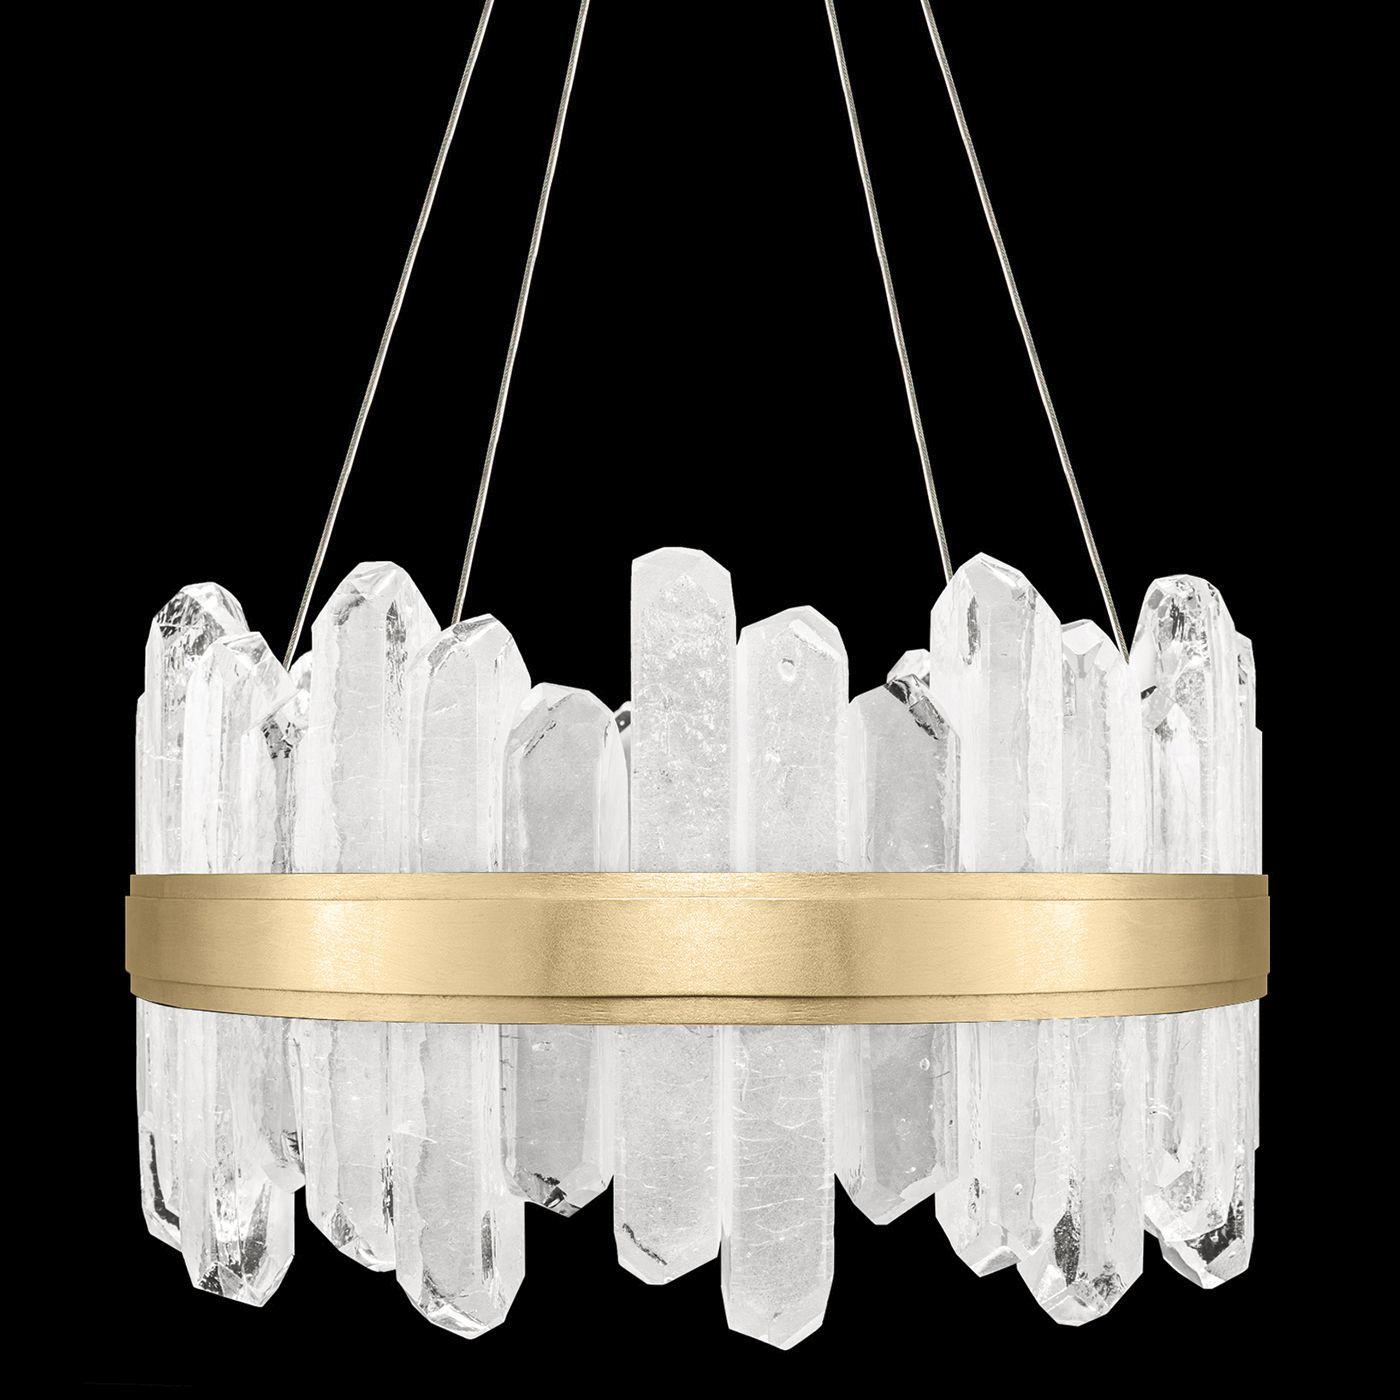 Lior short symmetrical crystals chandelier fine art lamps at lights arubaitofo Choice Image